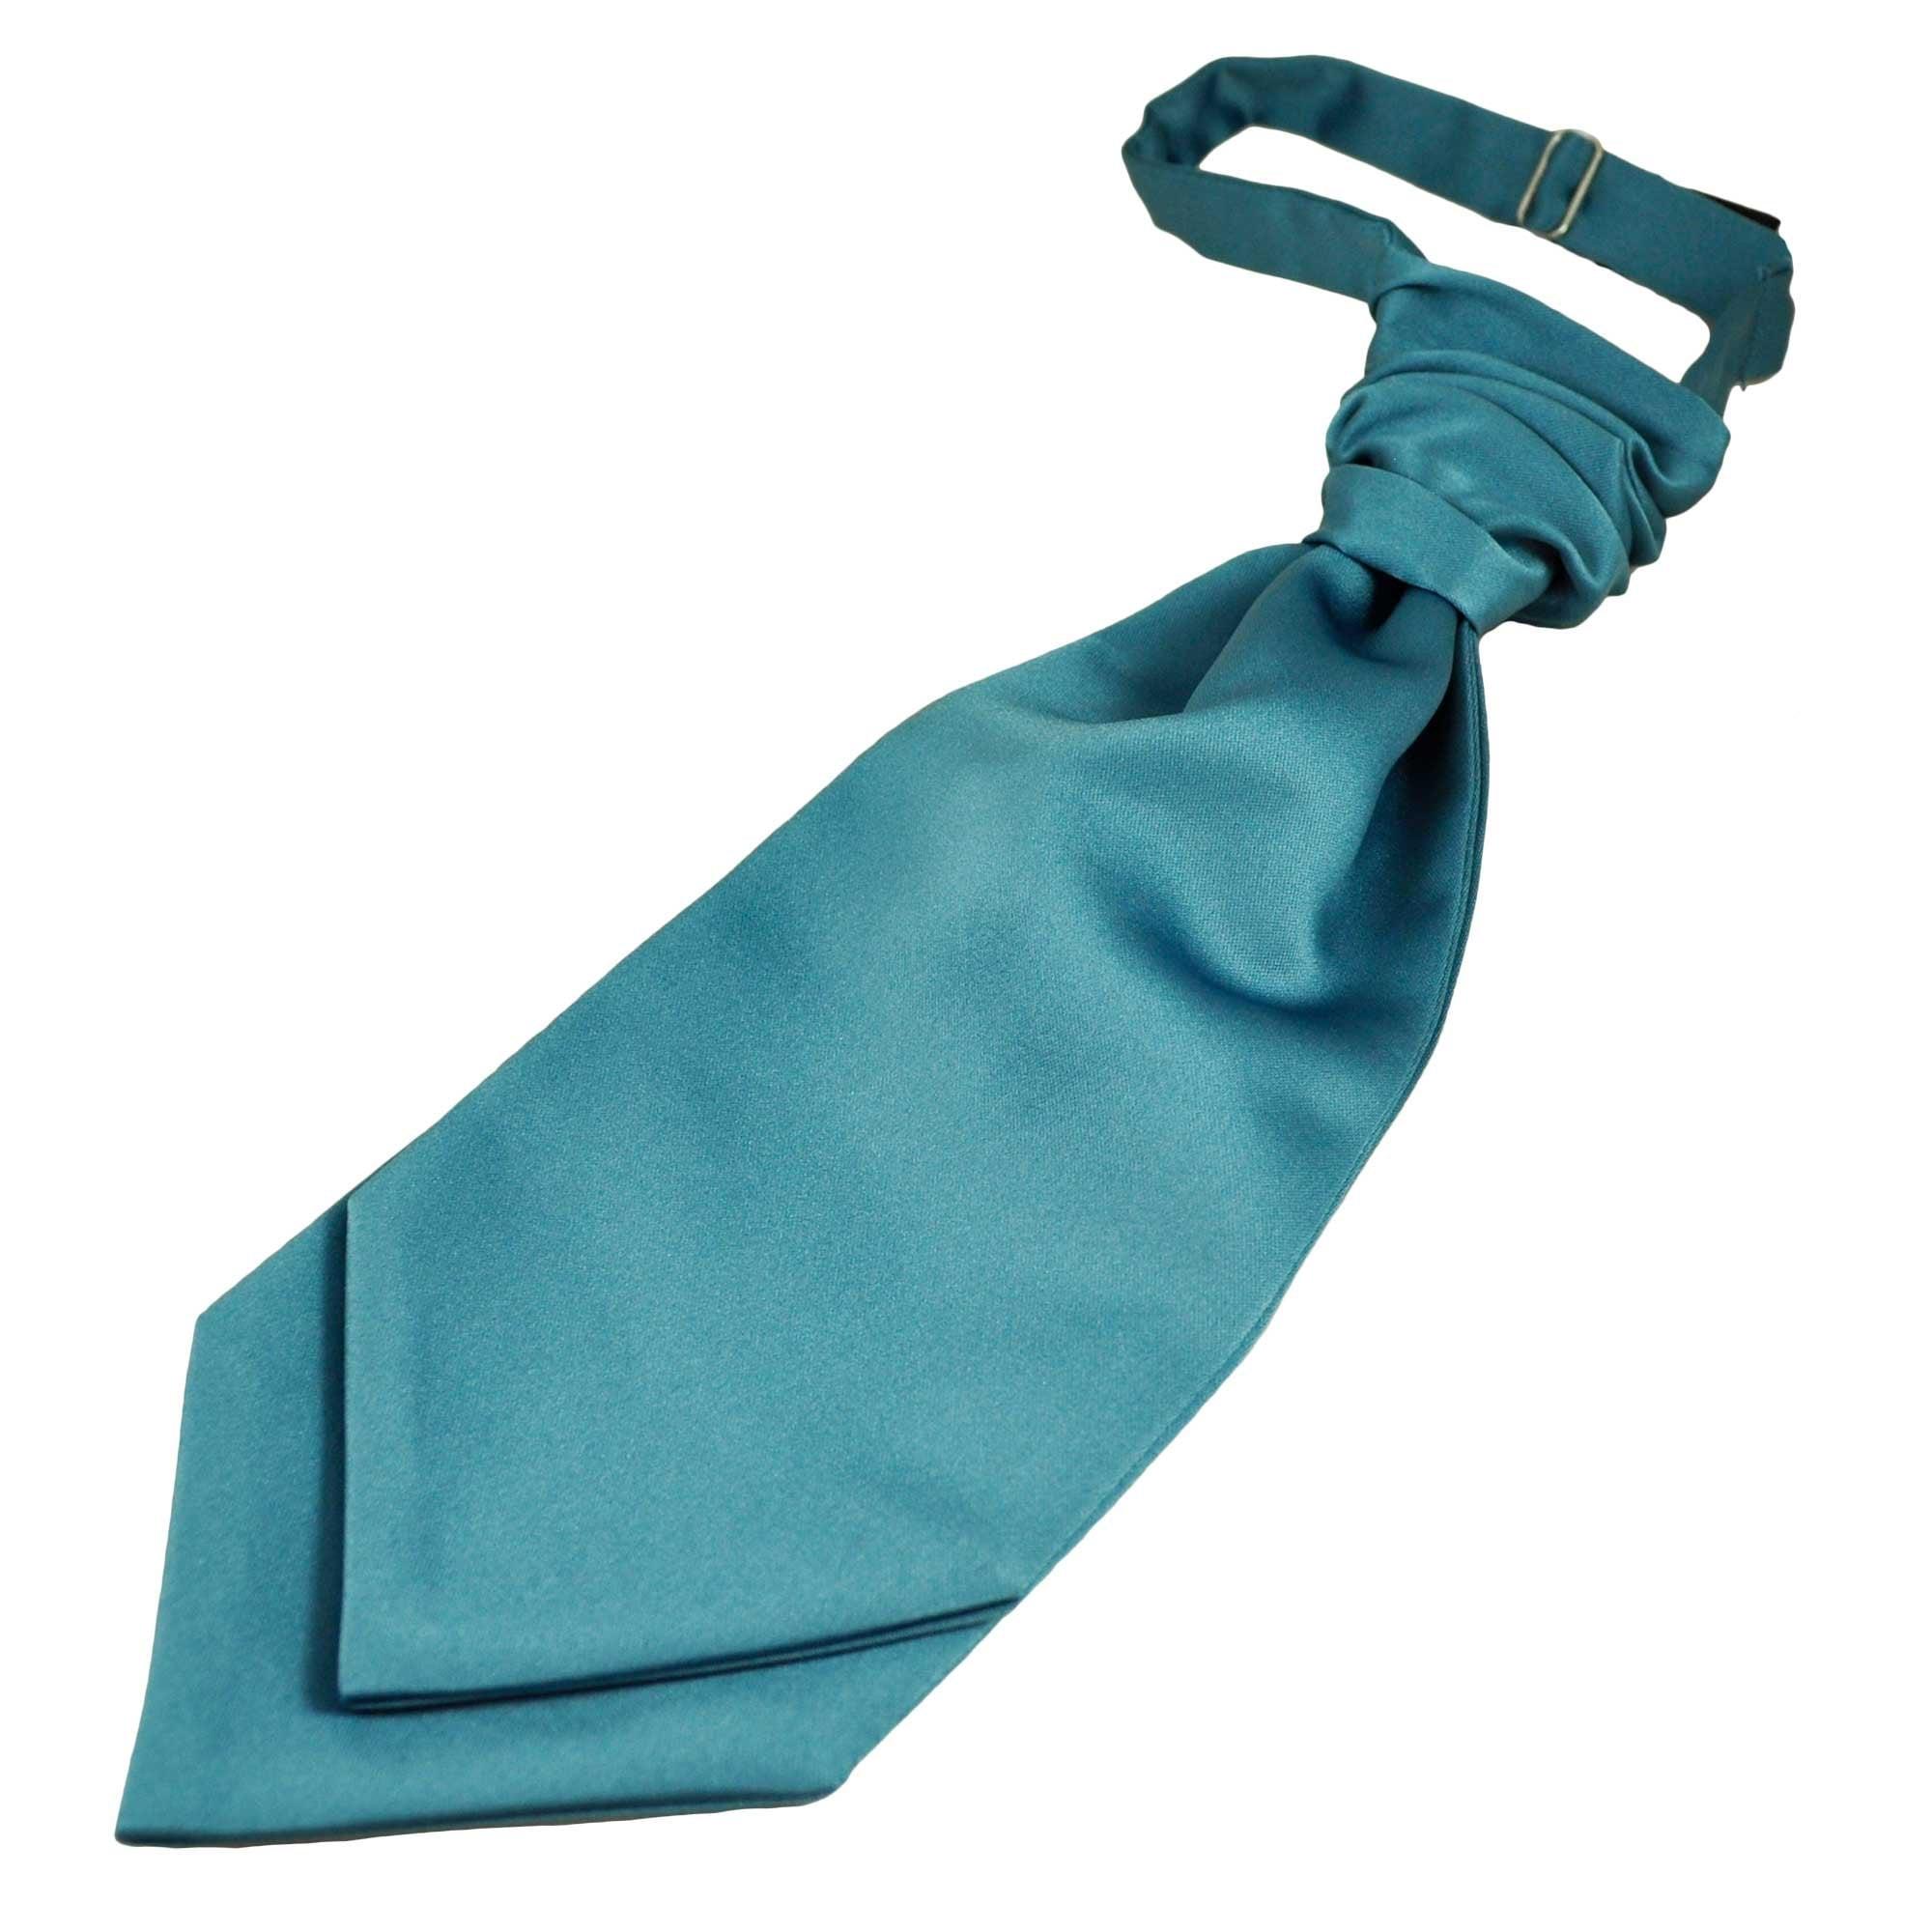 Teal blue cravat//ruched tie and pocket squares